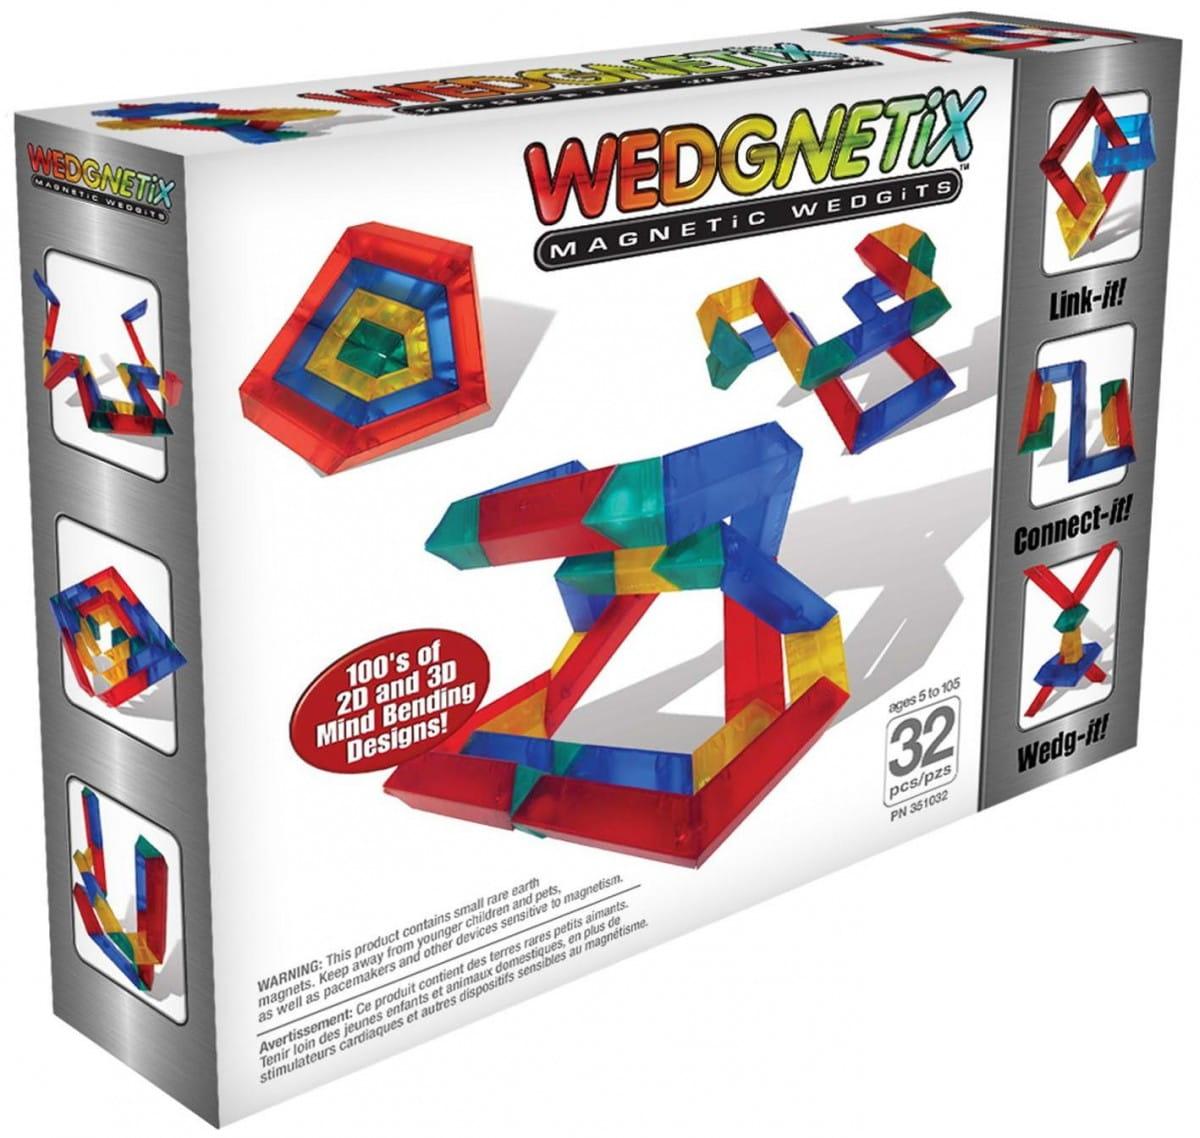 Конструктор Wedgits 351032 Wedgnetix - 32 детали